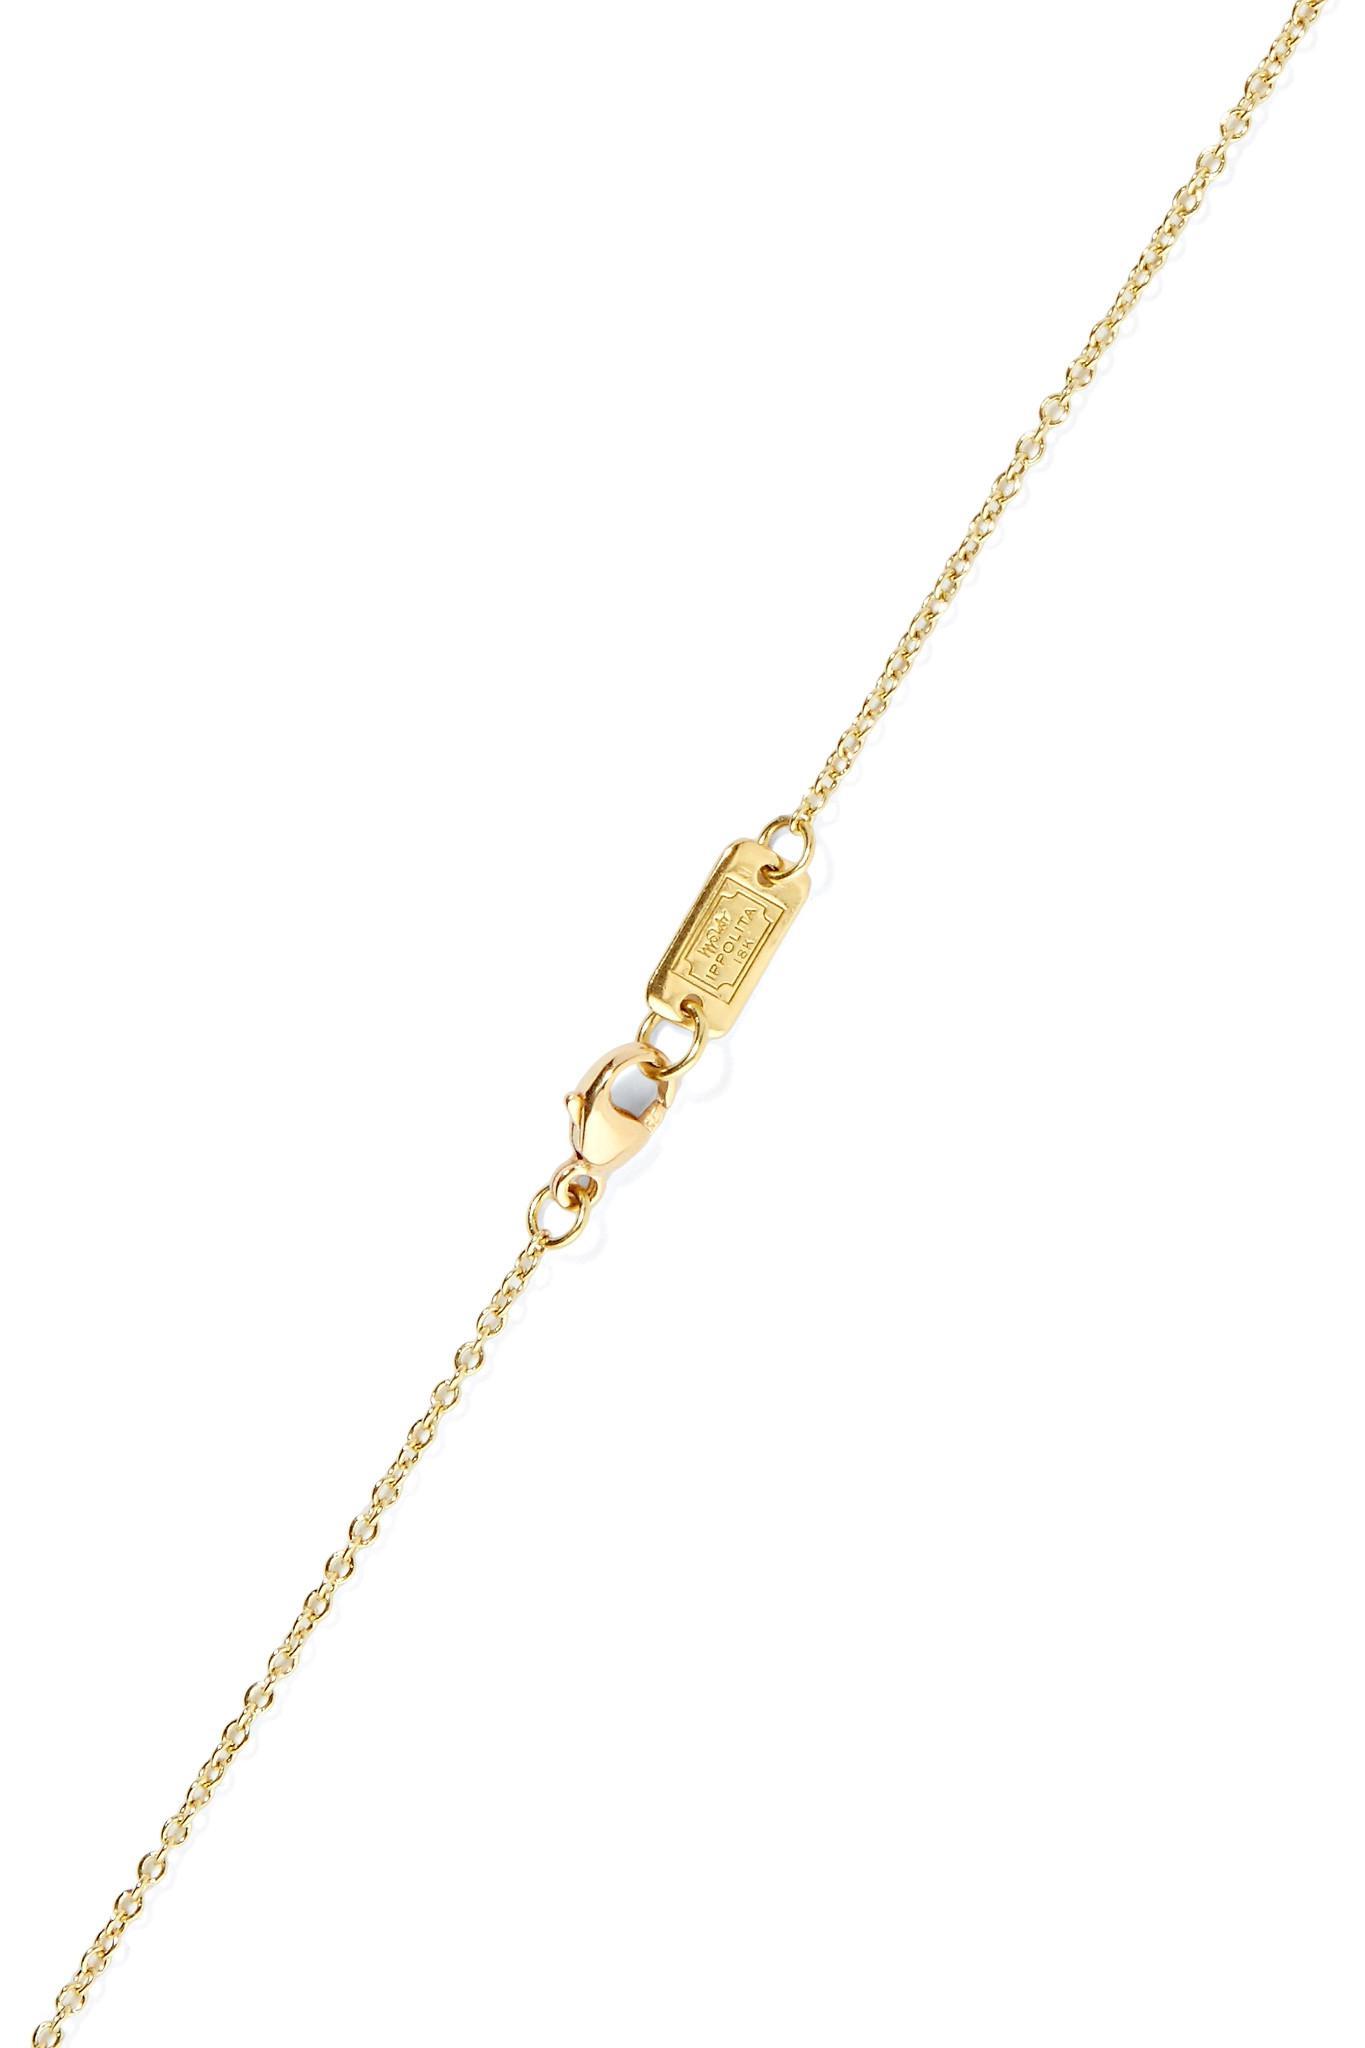 Ippolita Polished Rock Candy Confetti 18-karat Gold Shell Necklace KIrFCdgrn